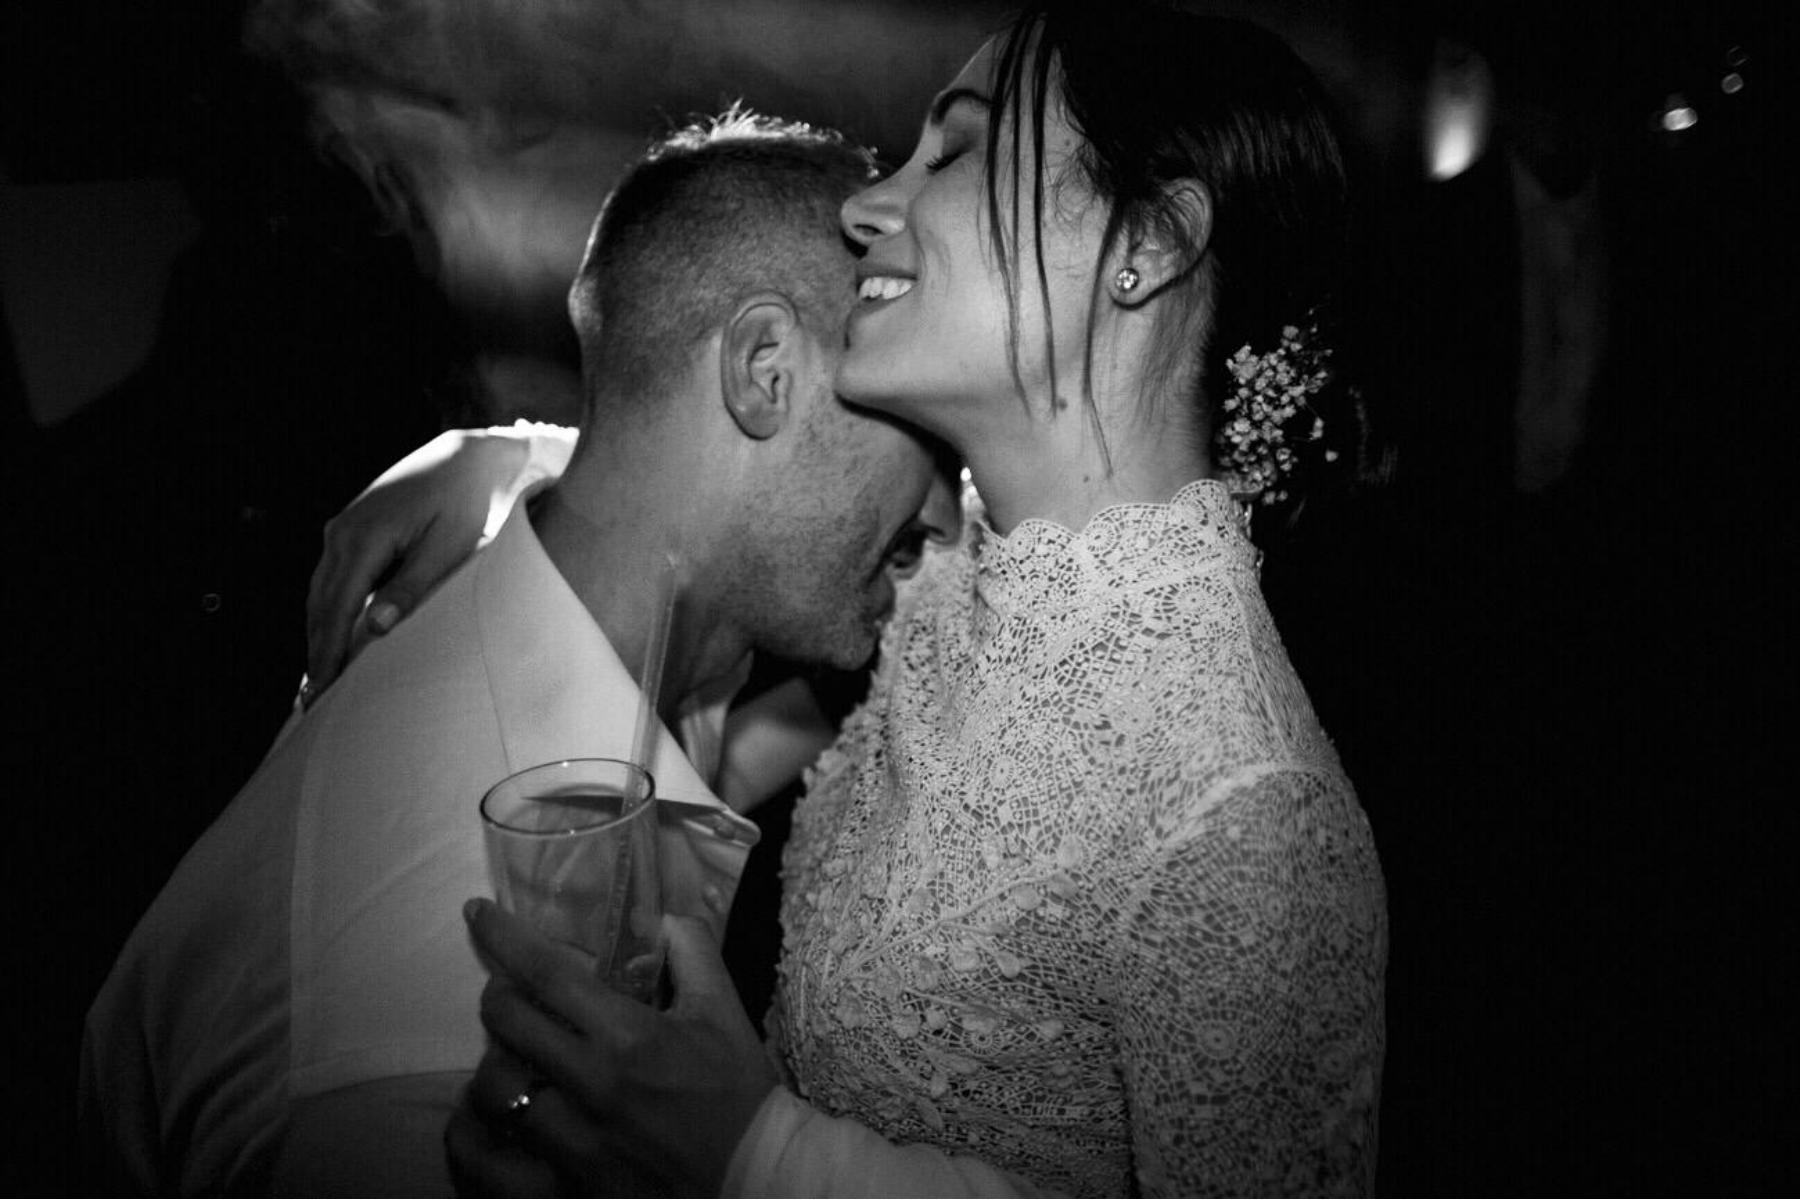 matrimoniotennisclubnapoli_blineventi-2